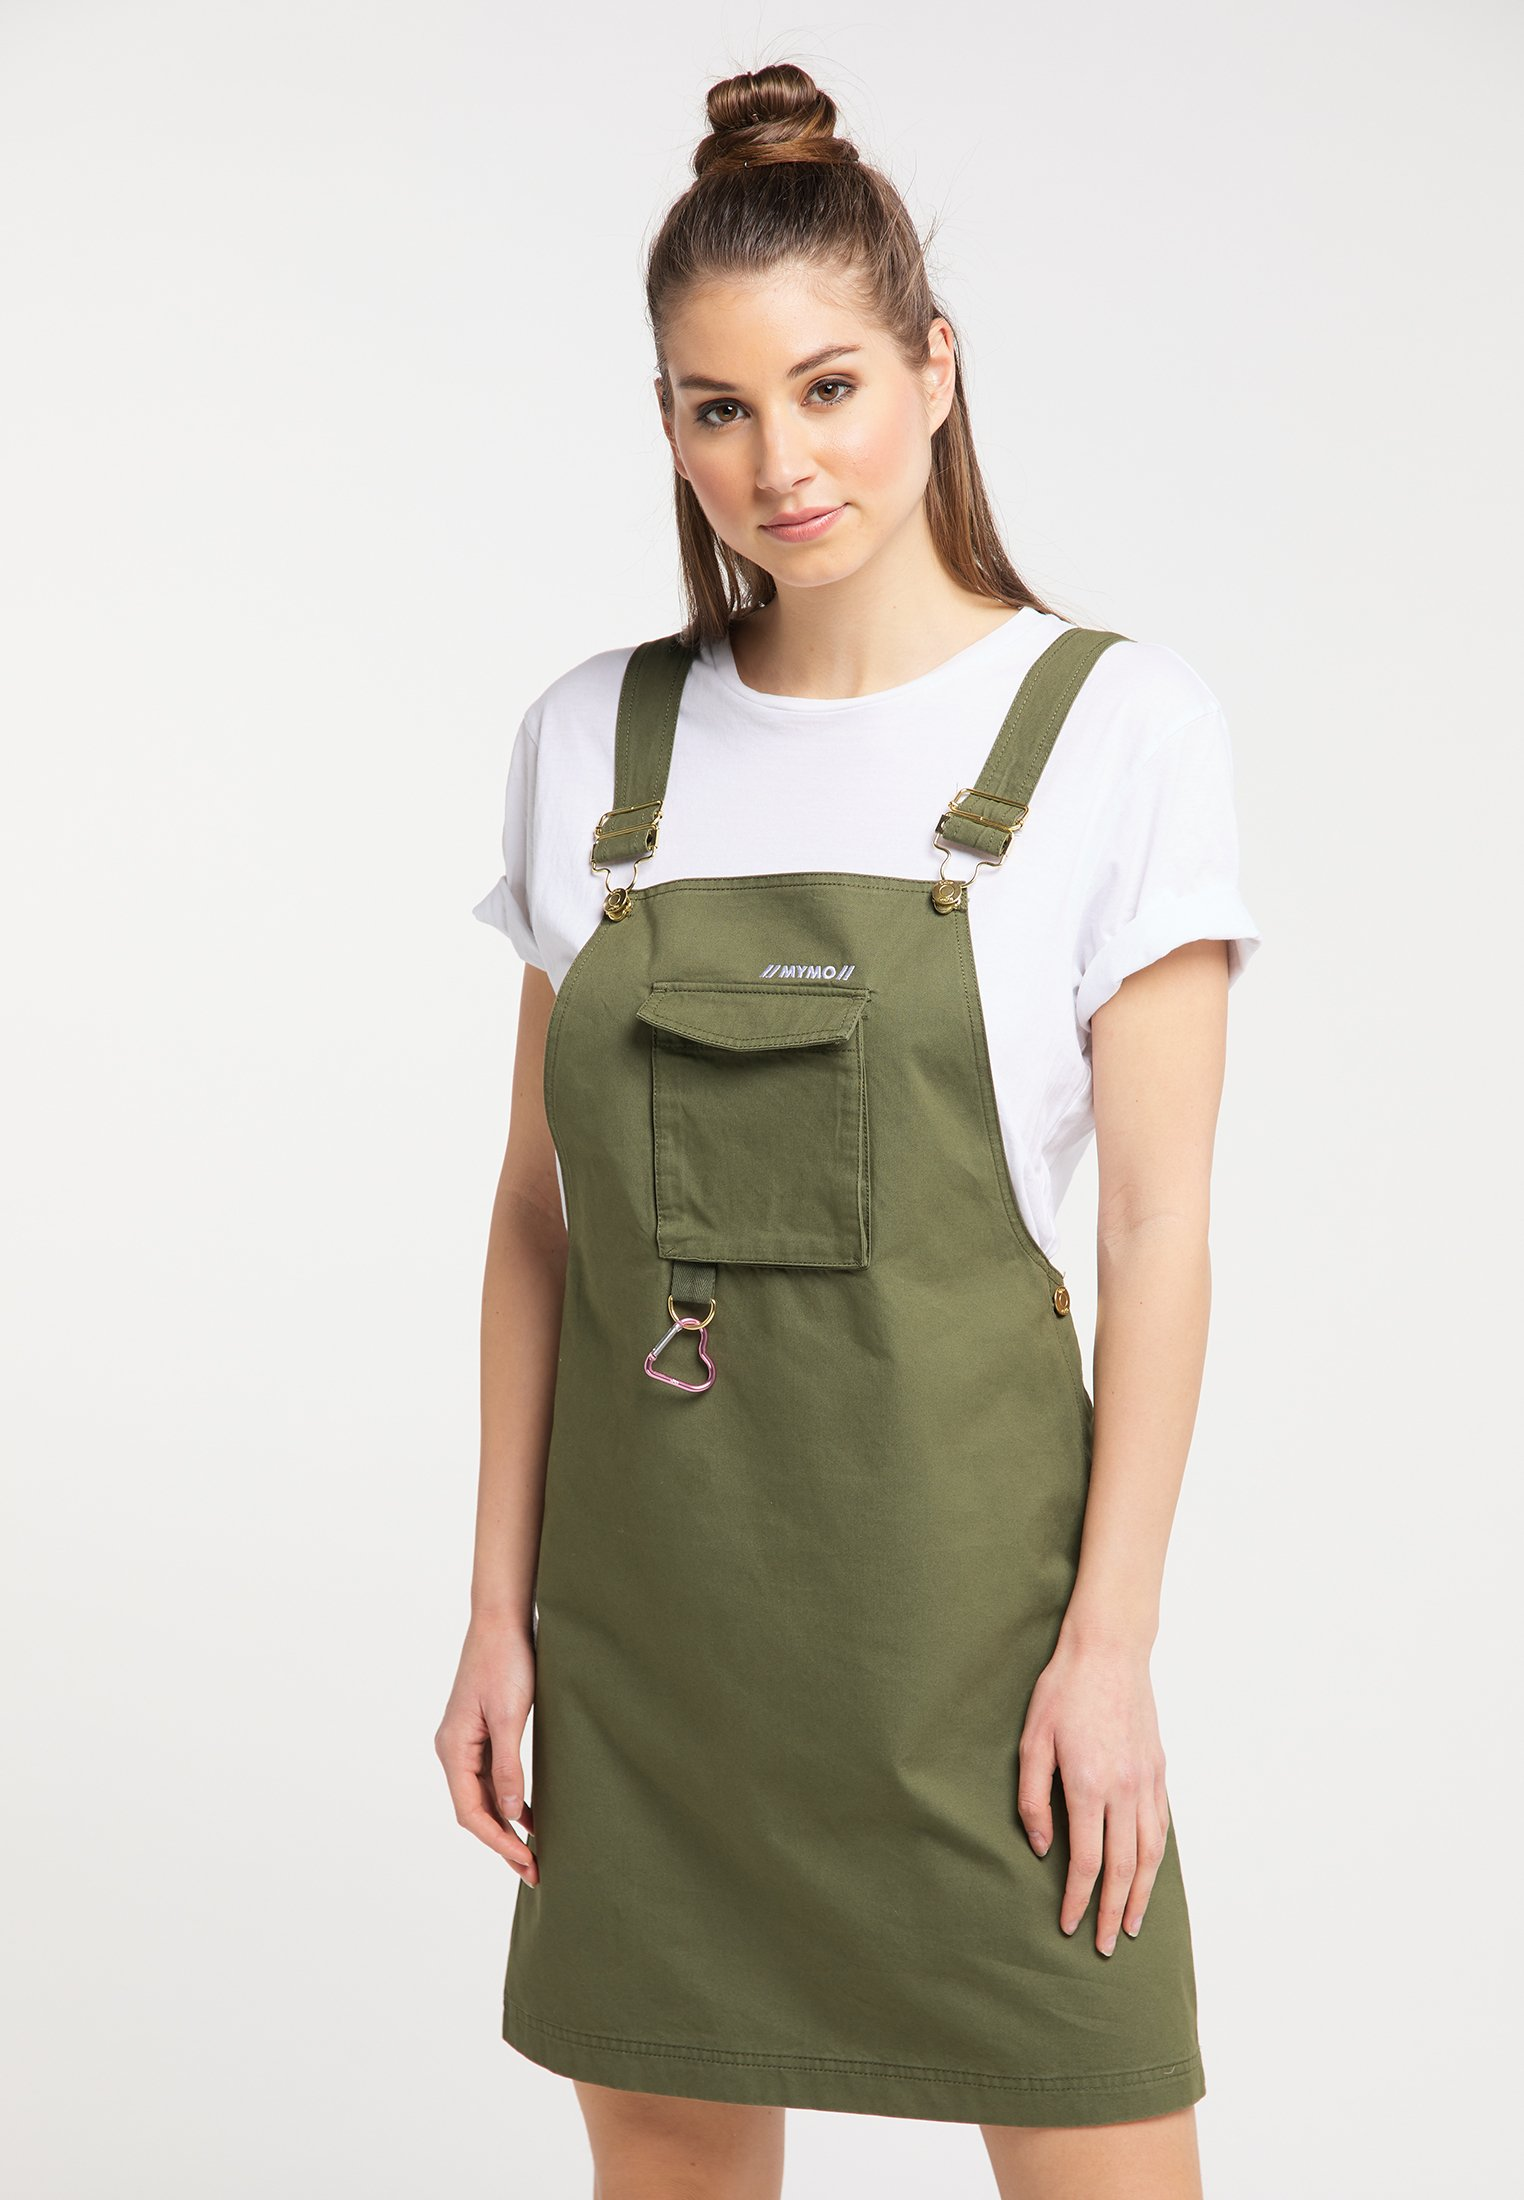 New Arrival Women's Clothing myMo Day dress military green 6jtetGHHo